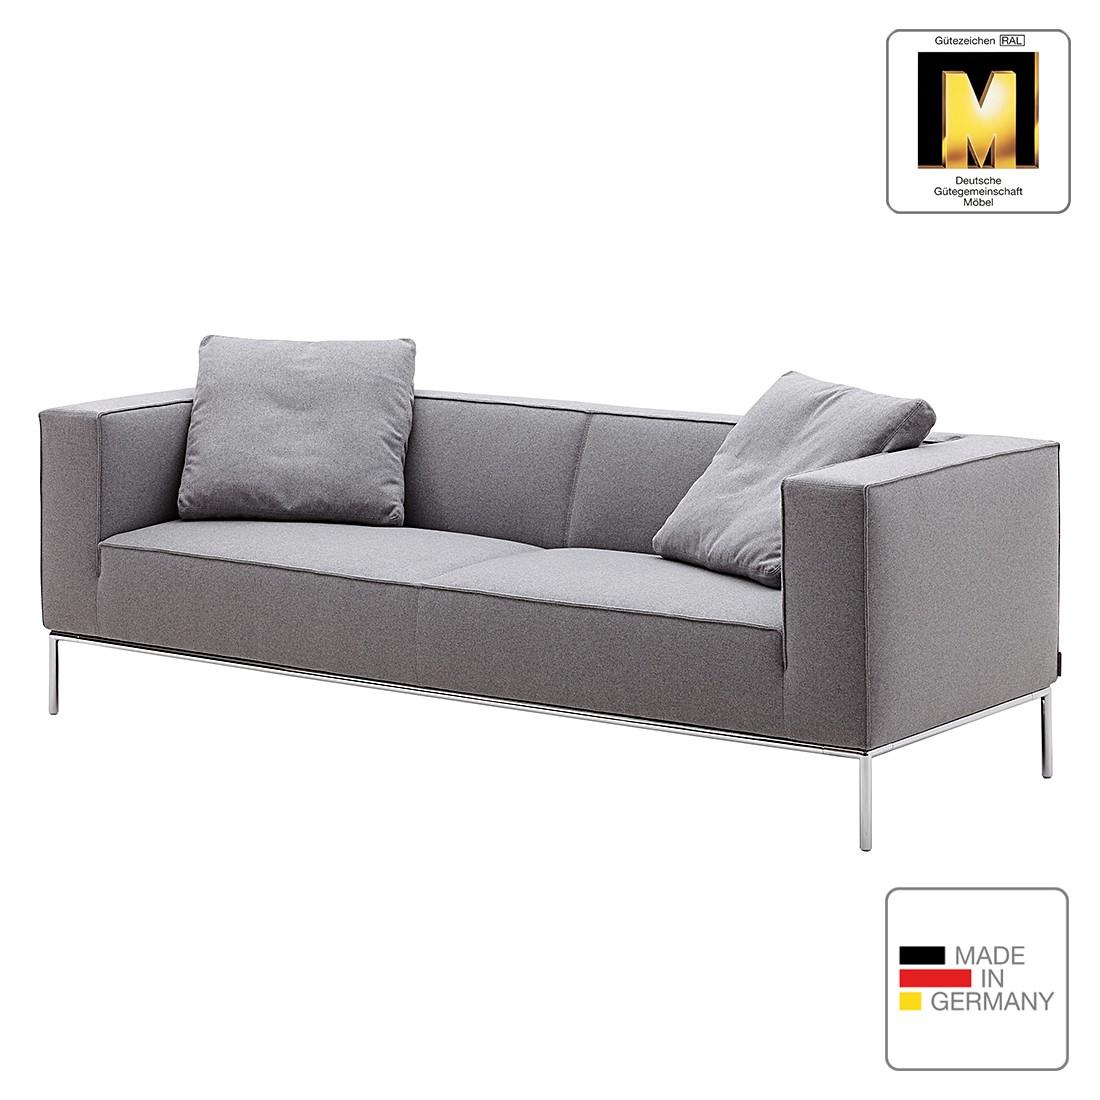 Cuscini divano tutte le offerte cascare a fagiolo - Cuscini divano on line ...